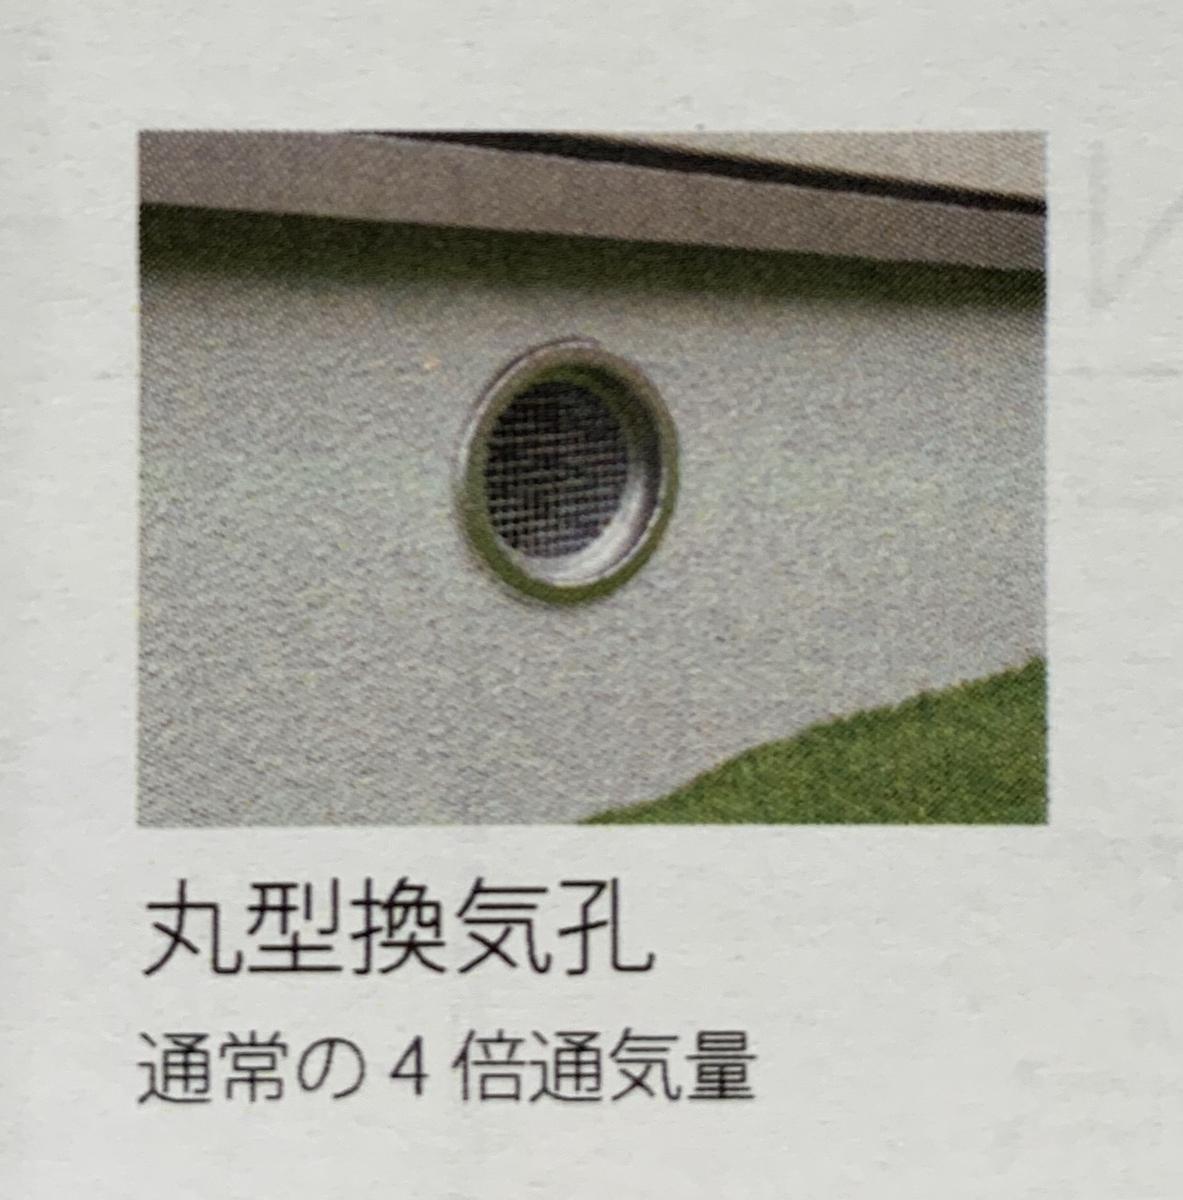 f:id:y-ogino:20191114161004j:plain